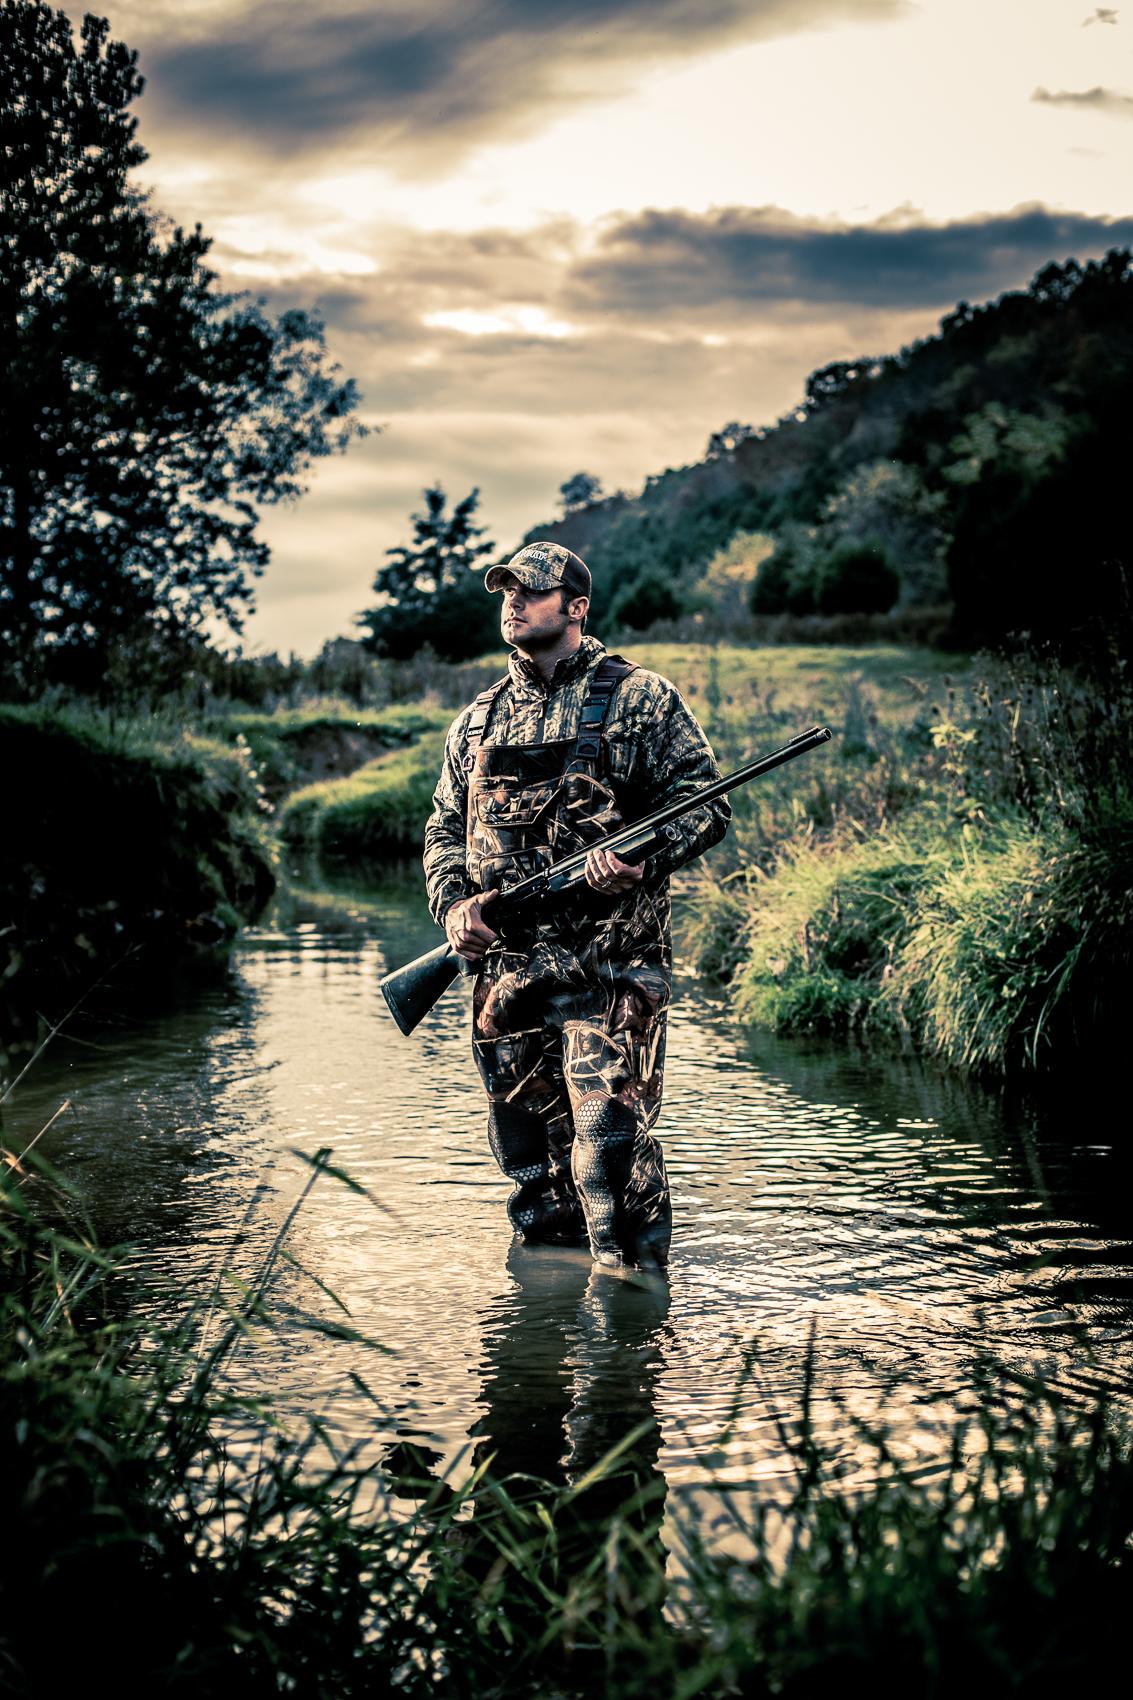 virginia-photographer-hunting-outdoors--9